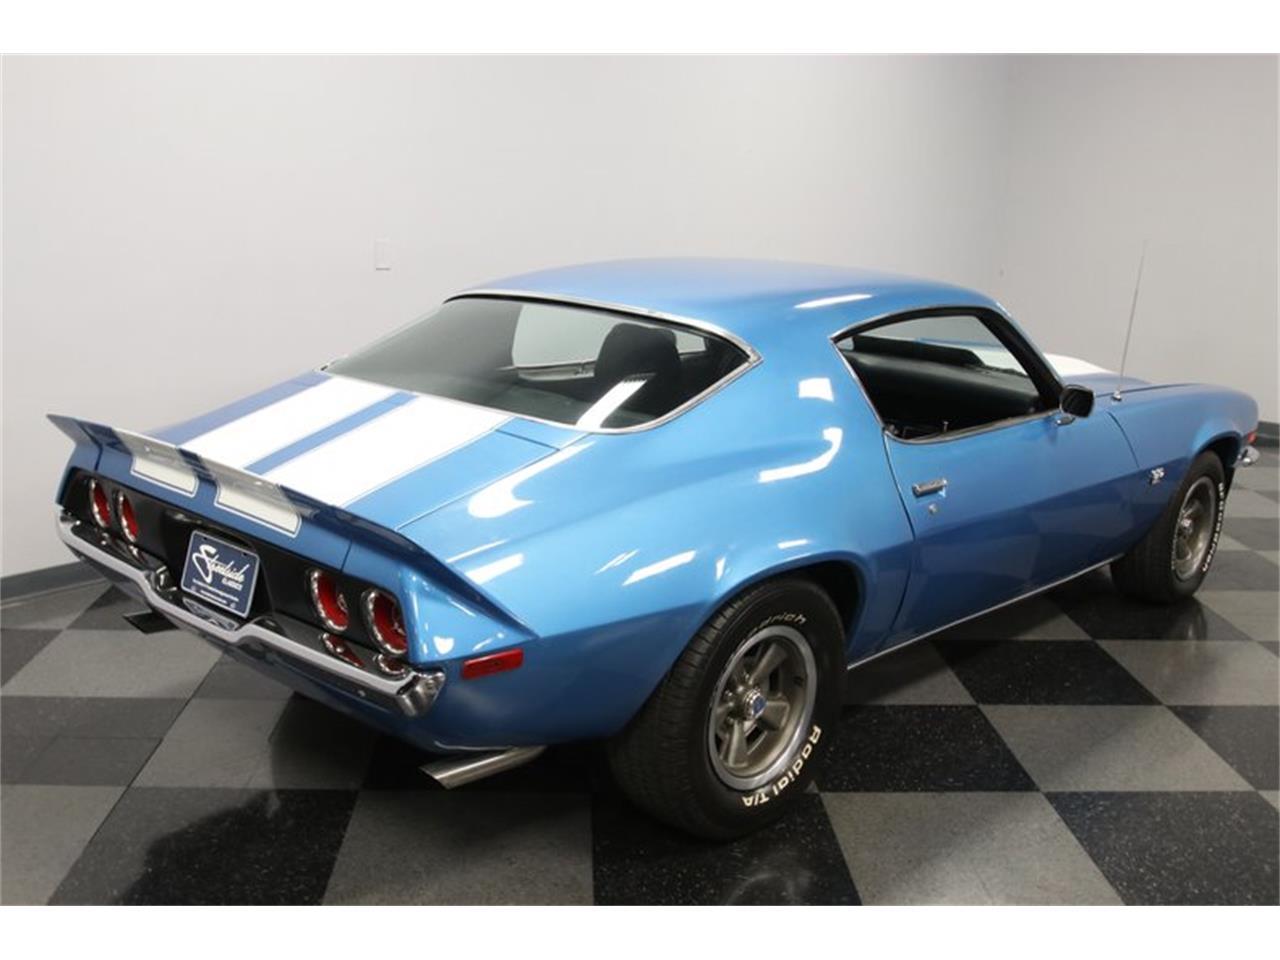 Large Picture of '70 Camaro located in Concord North Carolina - $36,995.00 - QRKC